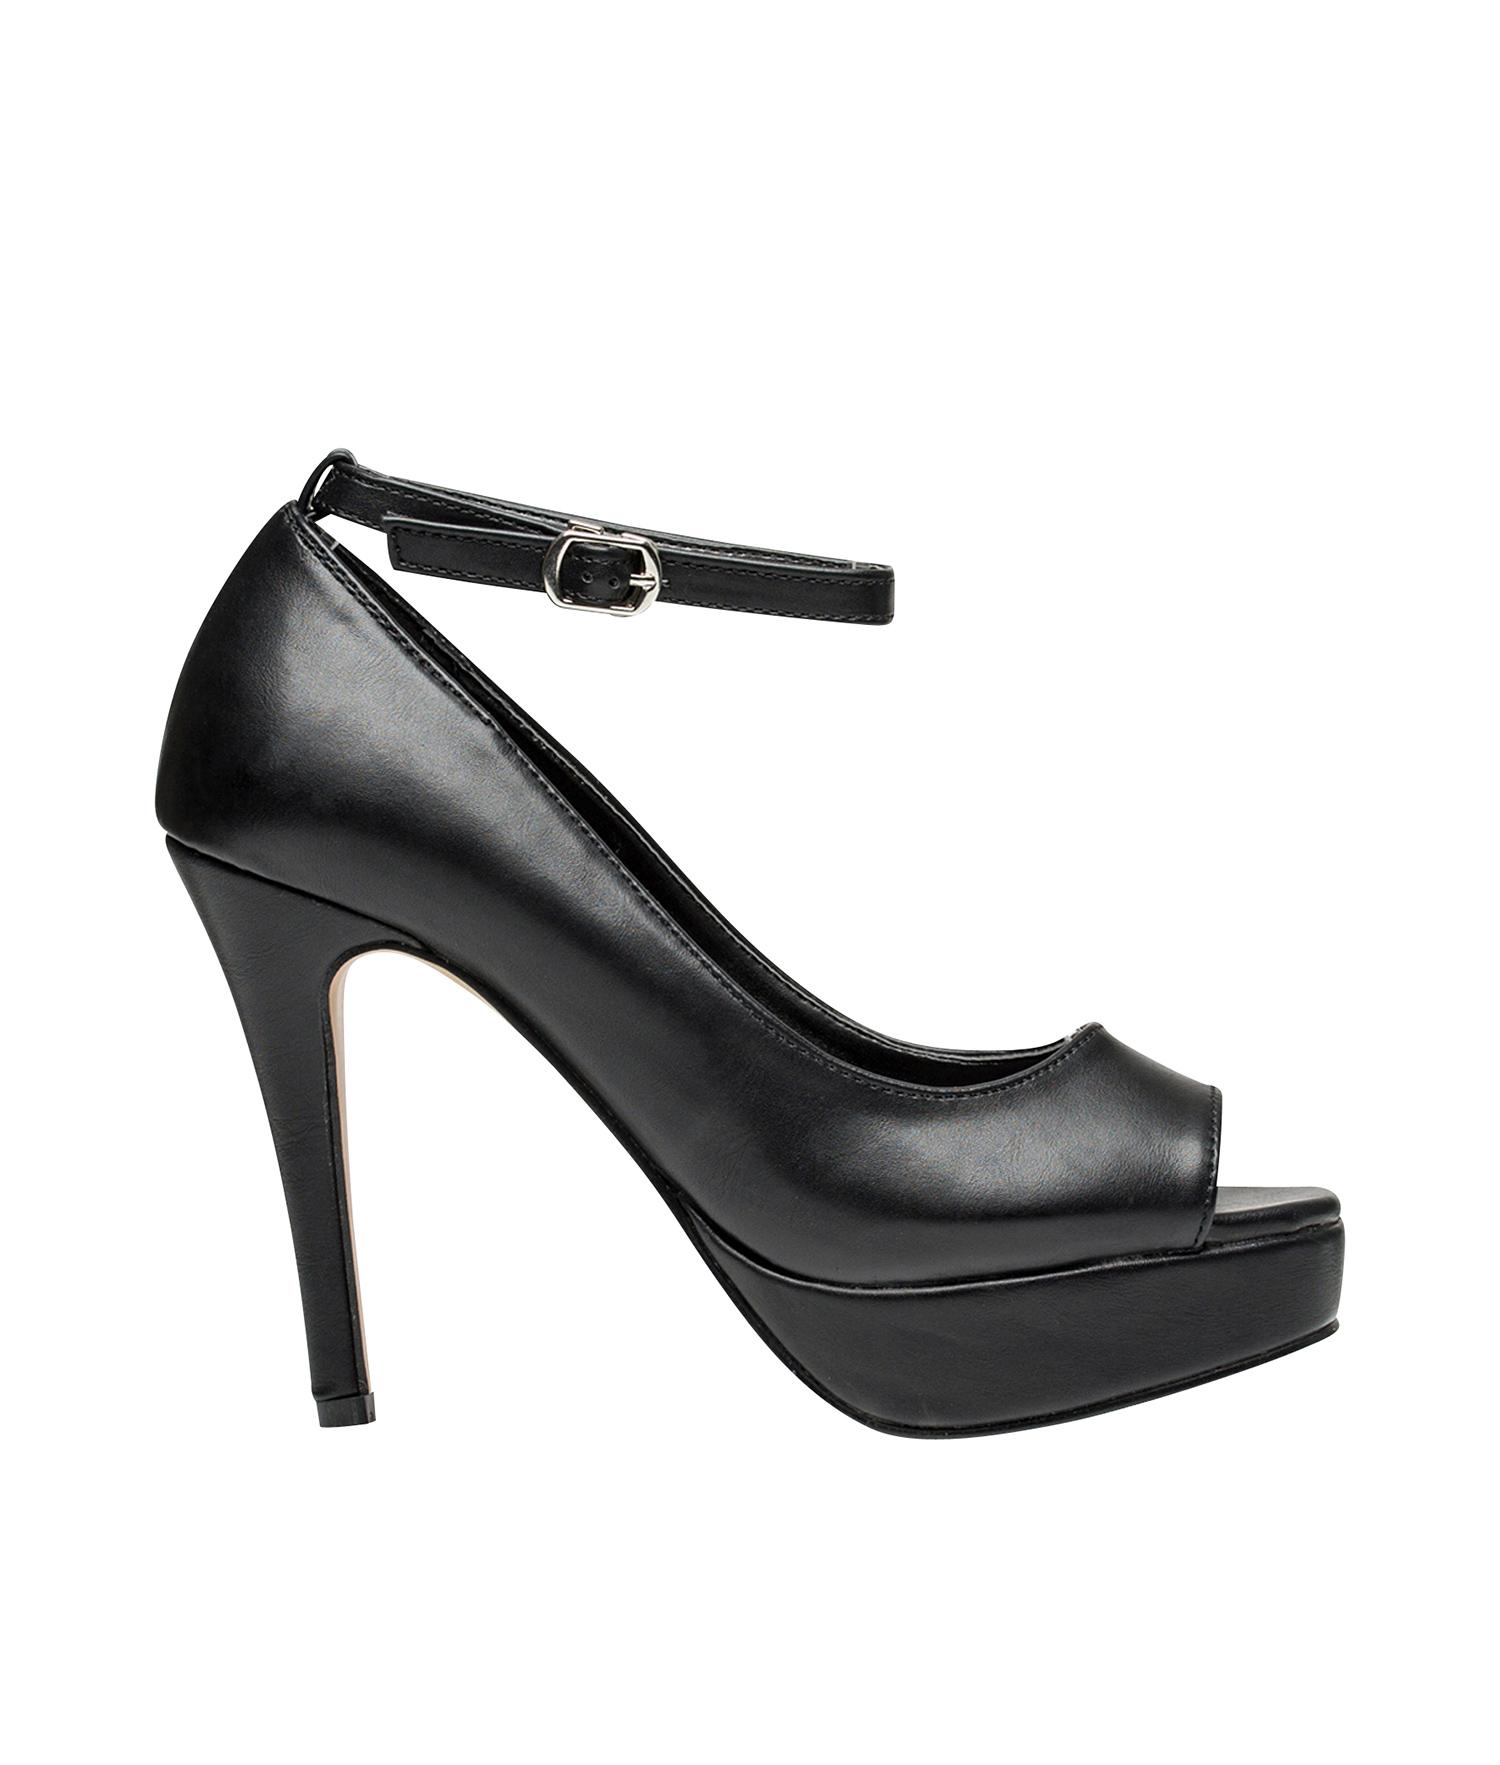 264849cb599 AnnaKastle Womens Peep Toe Platform Stiletto Heel Pumps Black